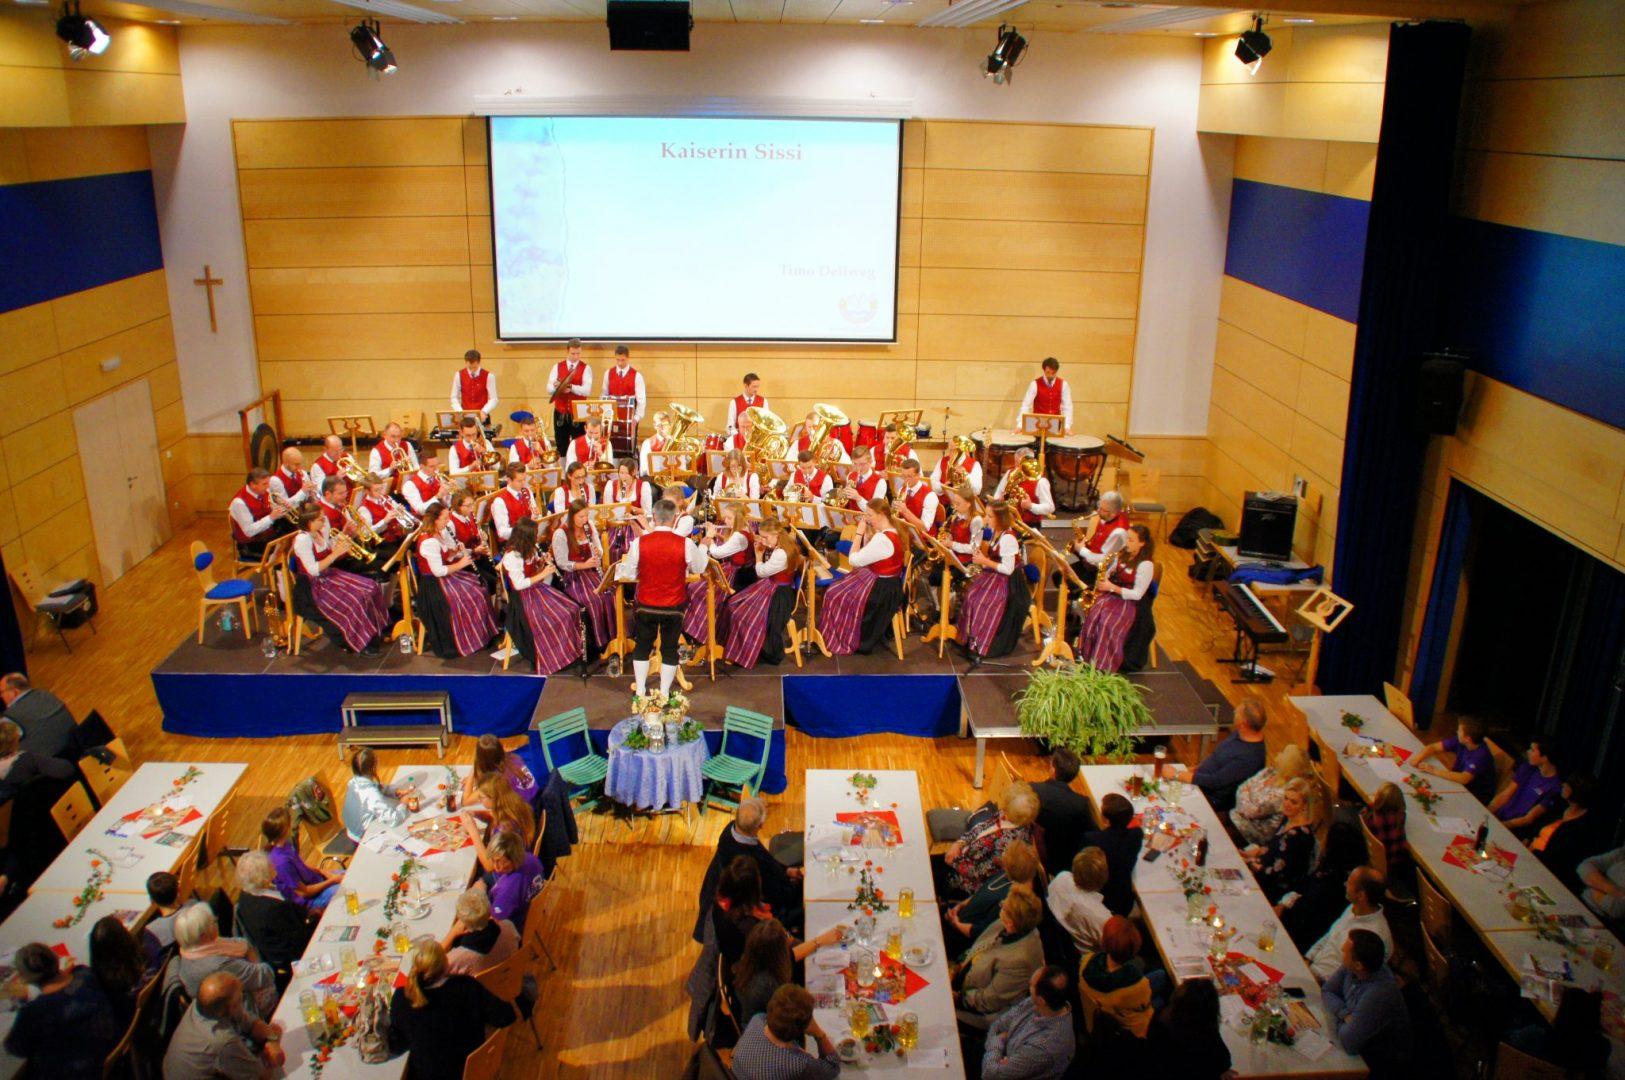 Herbstkonzert 2018 Saal Gäste (c) Klaus Hofinger